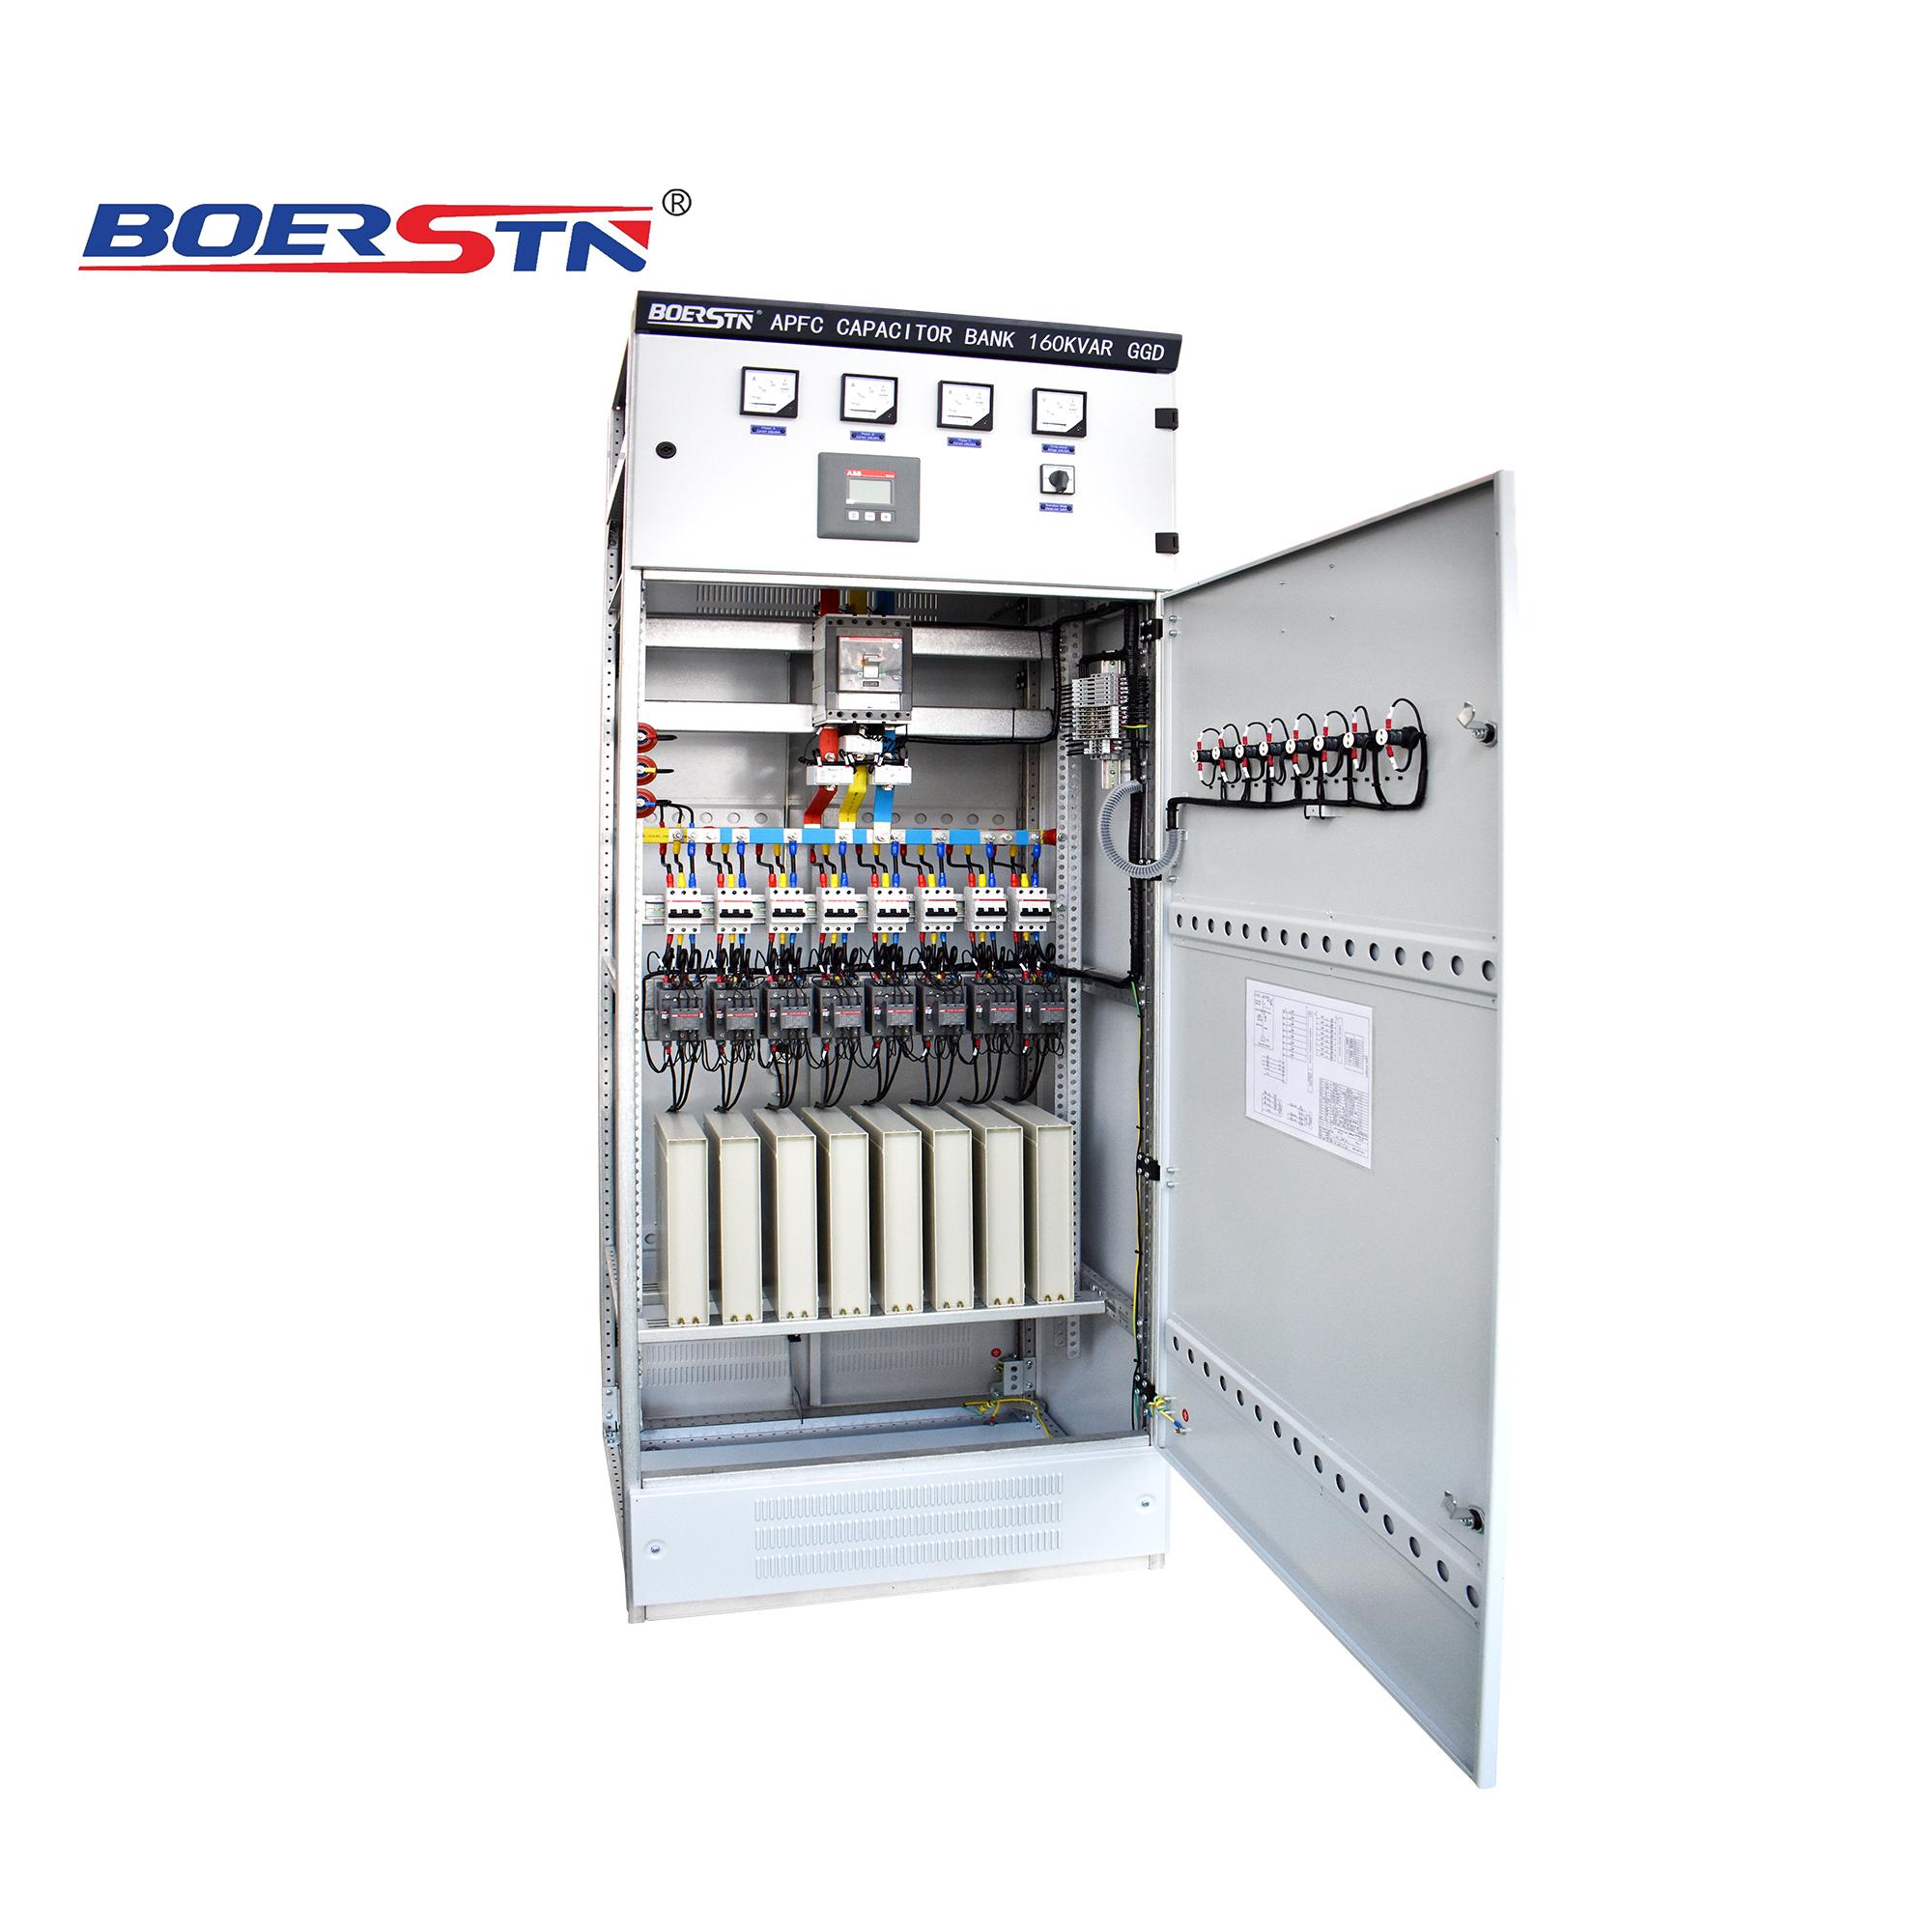 Low Voltage Power Factor Improver Pfi Regulator Capacitor Bank With Reactive Panel Board Buy Power Factor Improver Power Factor Regulator Capacitor Bank With Reactive Product On Alibaba Com